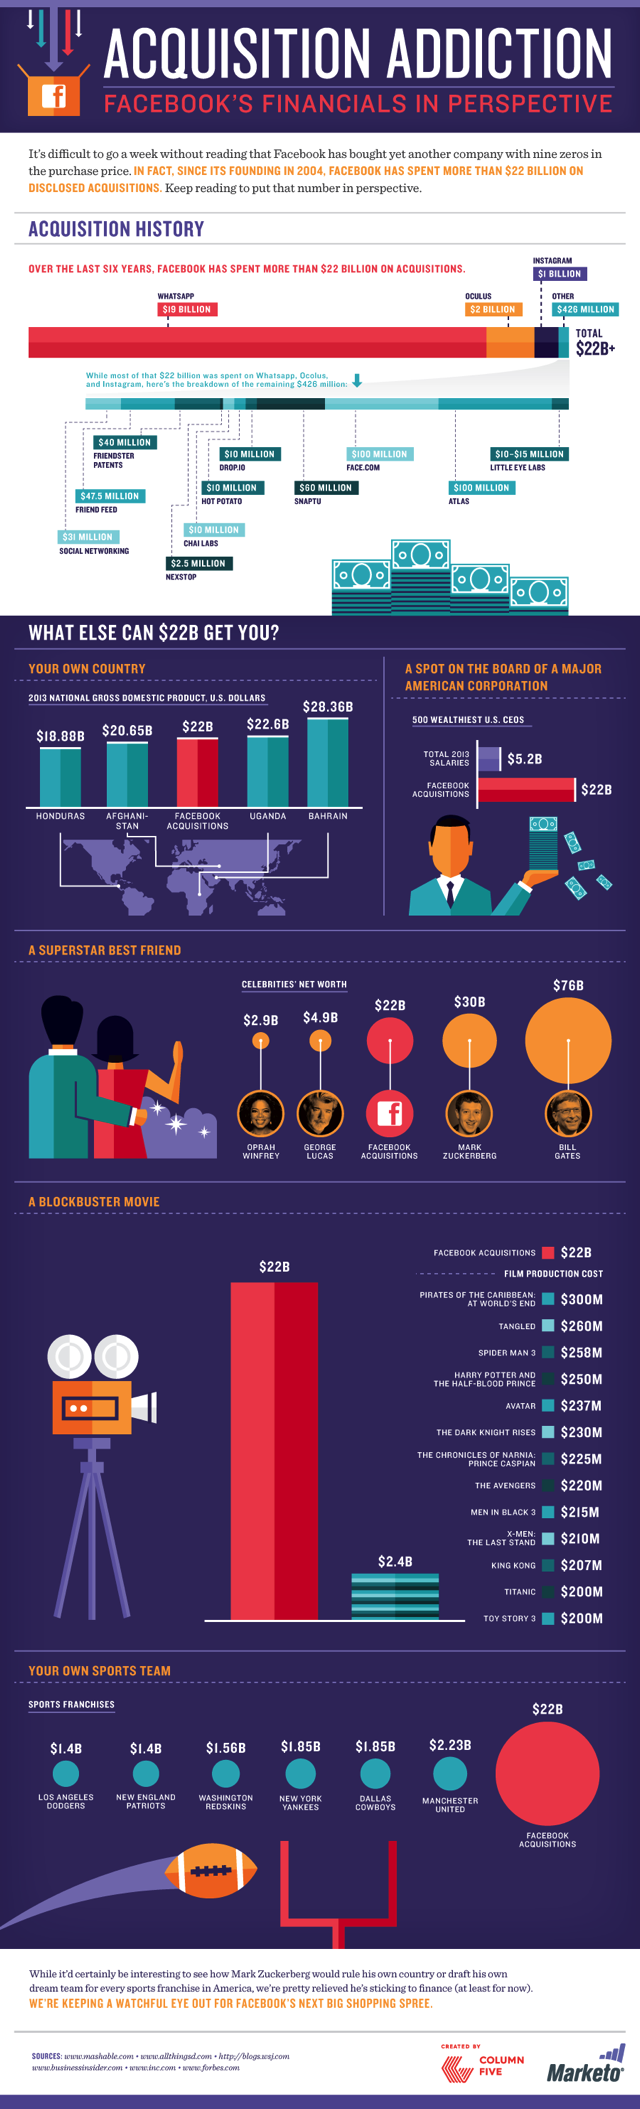 Facebook Acquisition Addiction Infographic